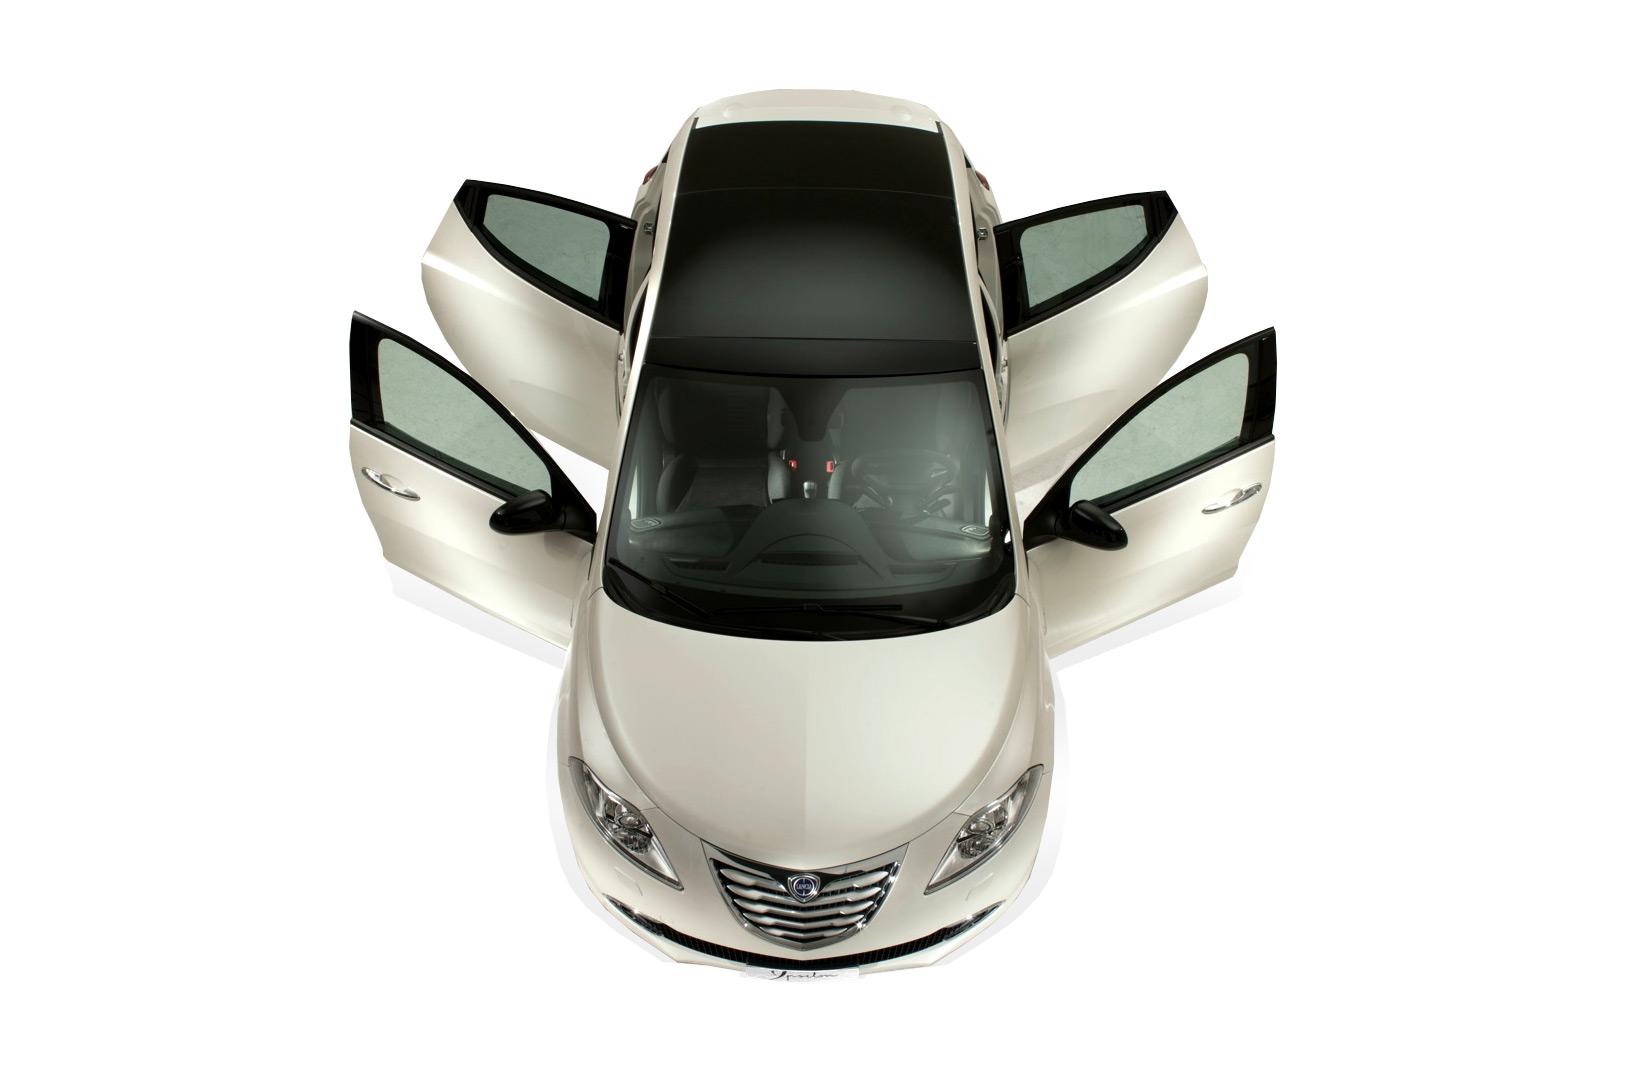 Lancia ypsilon 2011 in vendita a partire da giugno lancia y diva 2011 - Lancia y diva 2010 ...